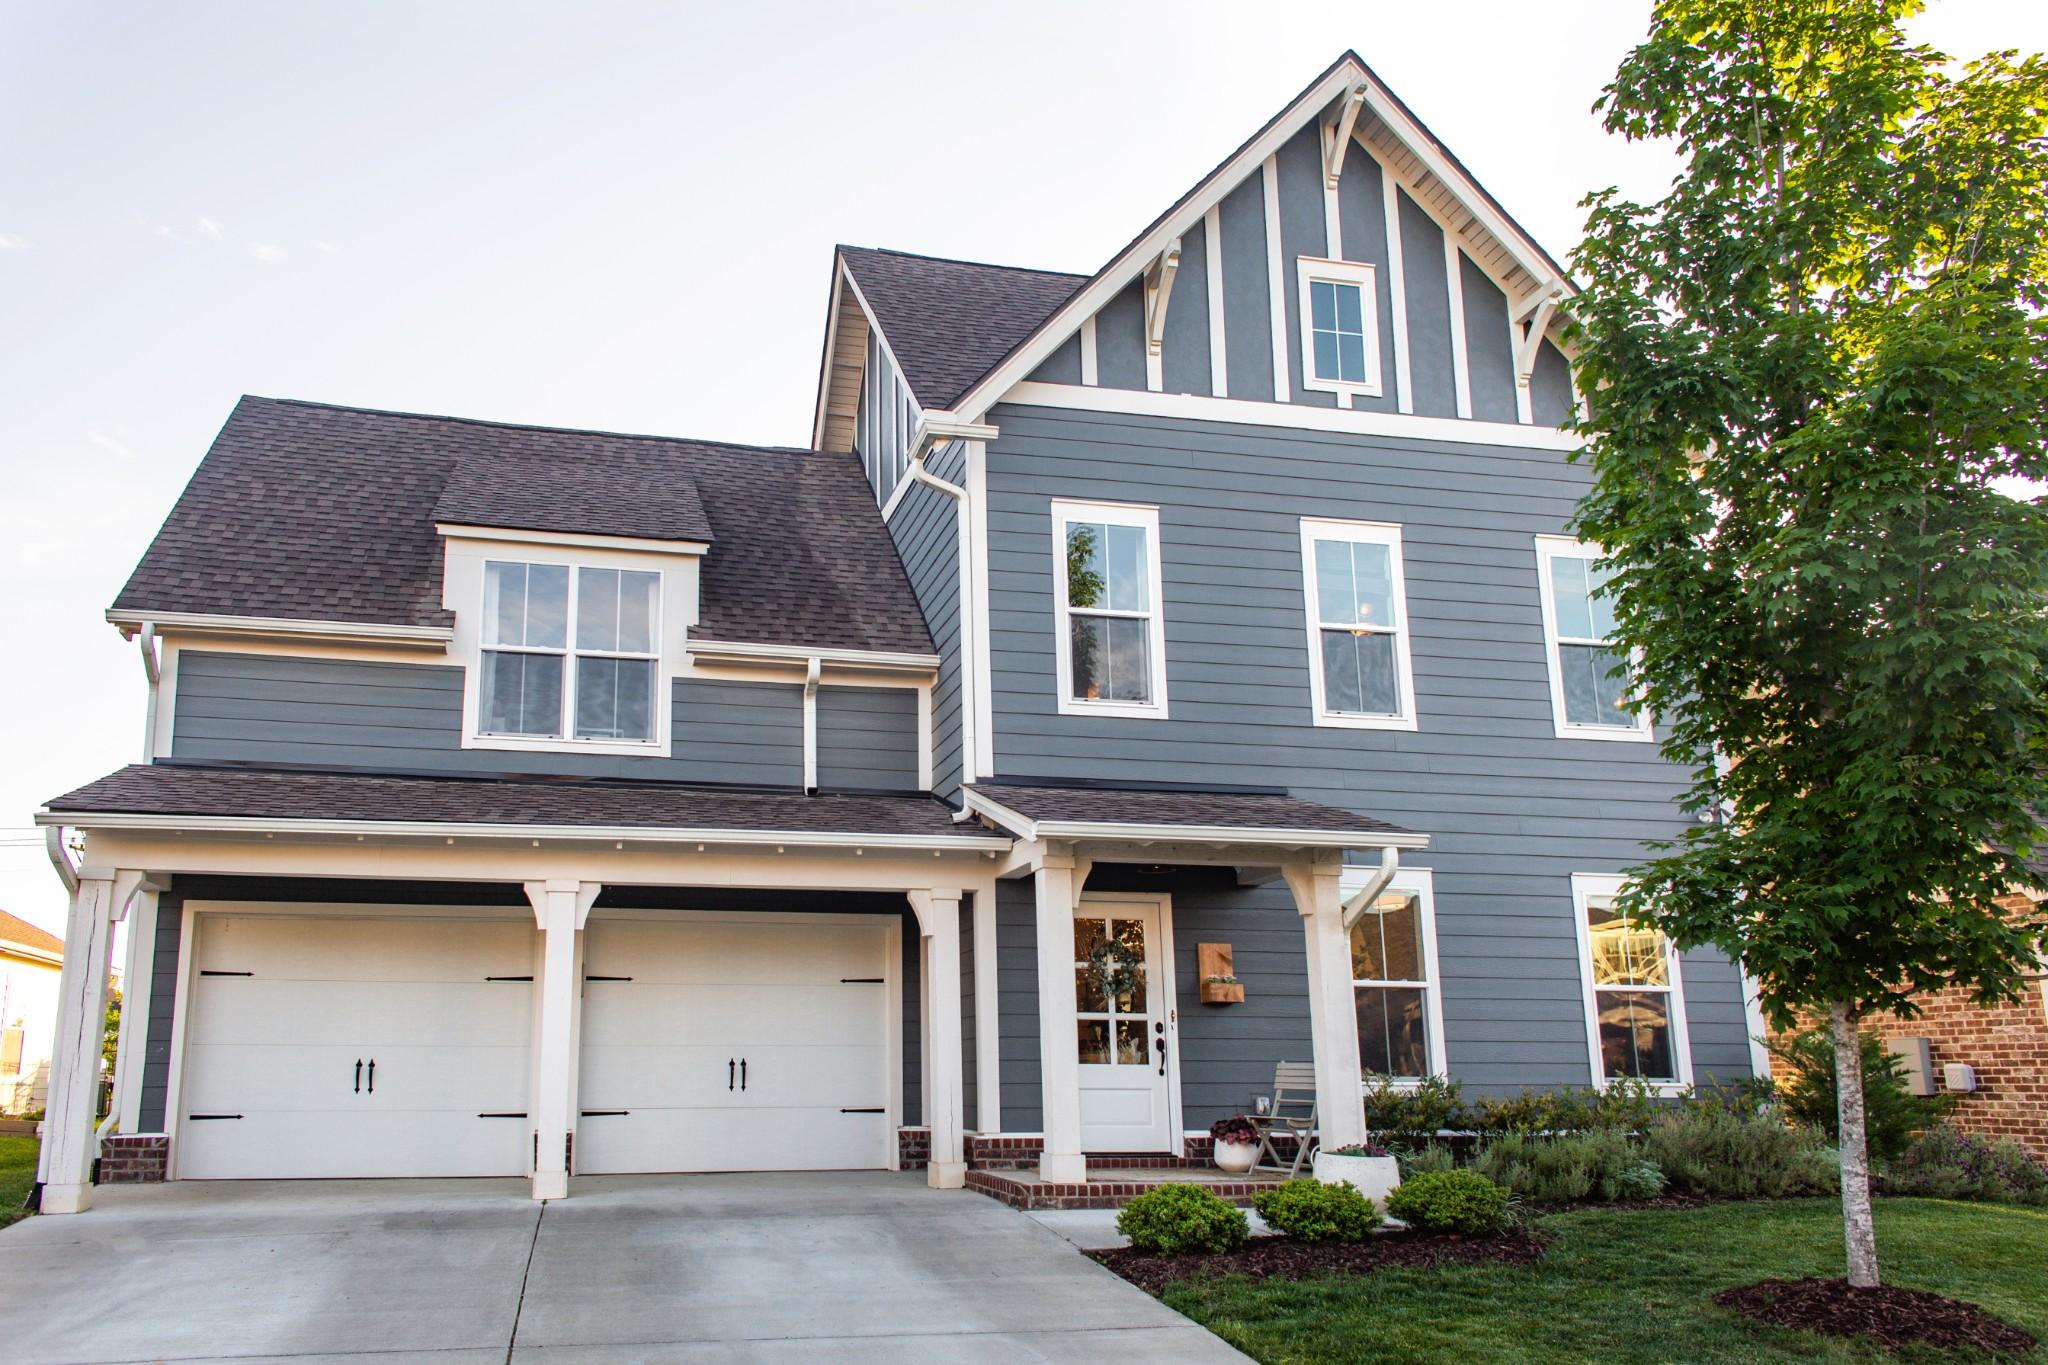 3037 Ryecroft Ln, Franklin, TN 37064 - Franklin, TN real estate listing